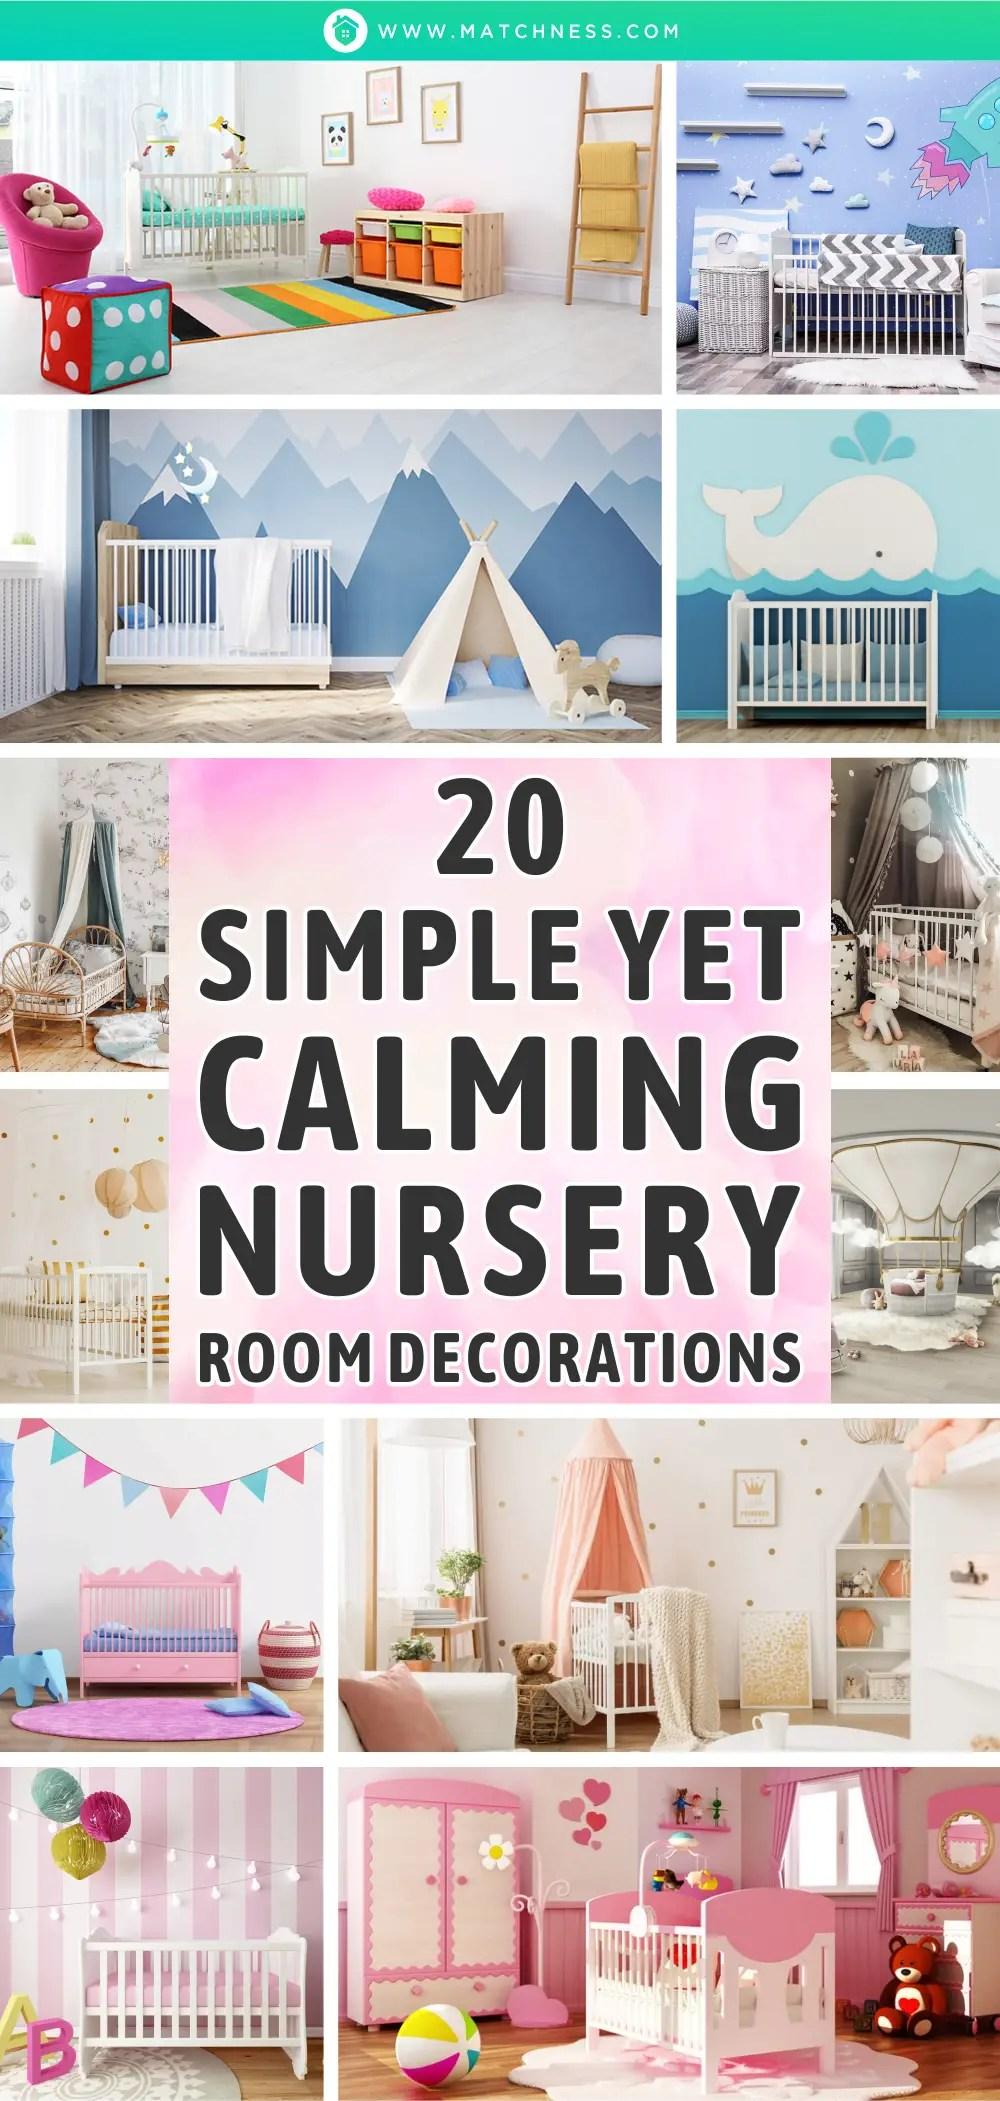 20-simple-yet-calming-nursery-room-decorations1